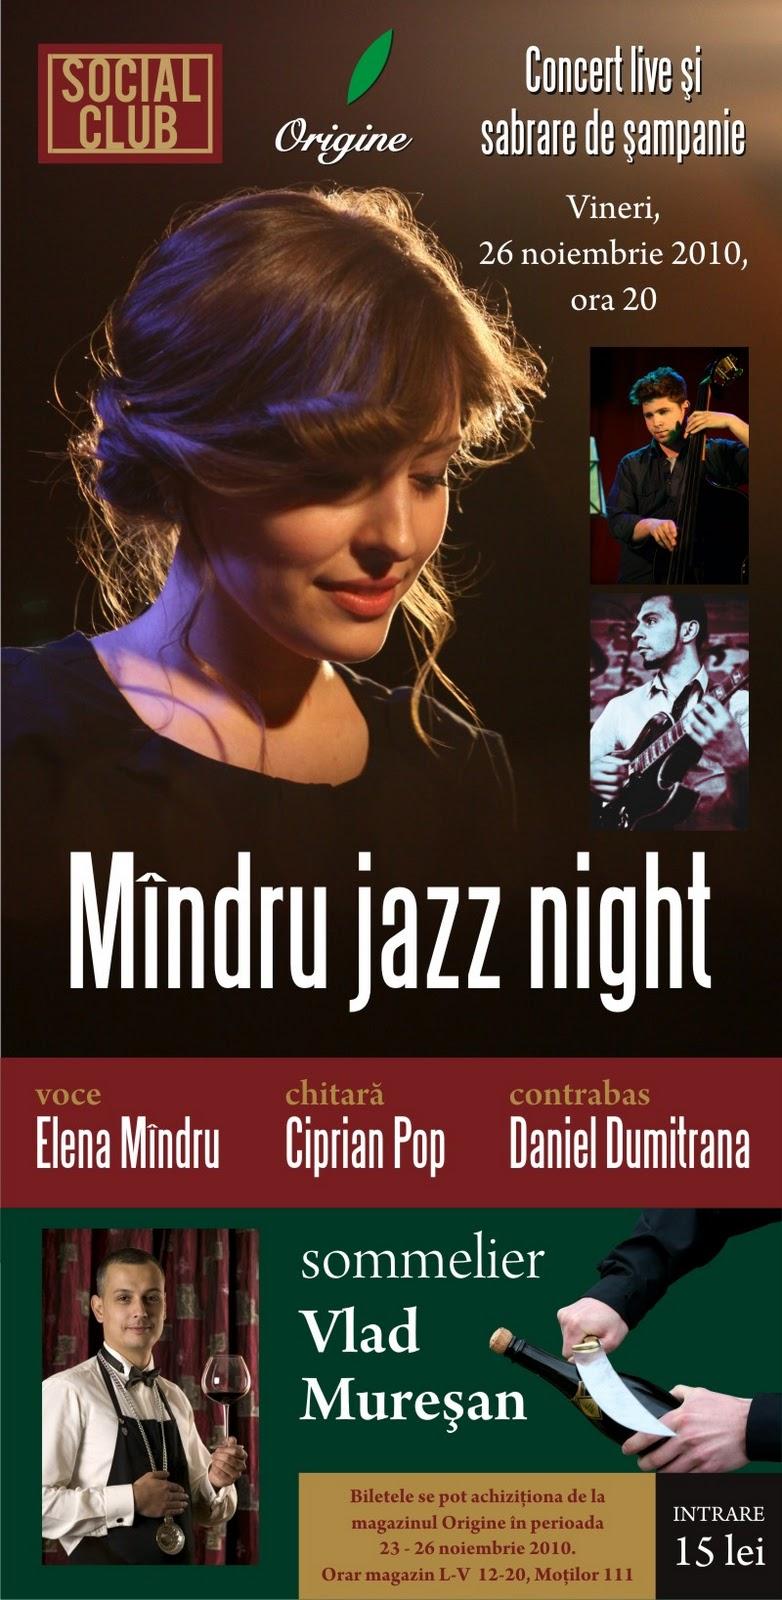 Mindru Jazz Night